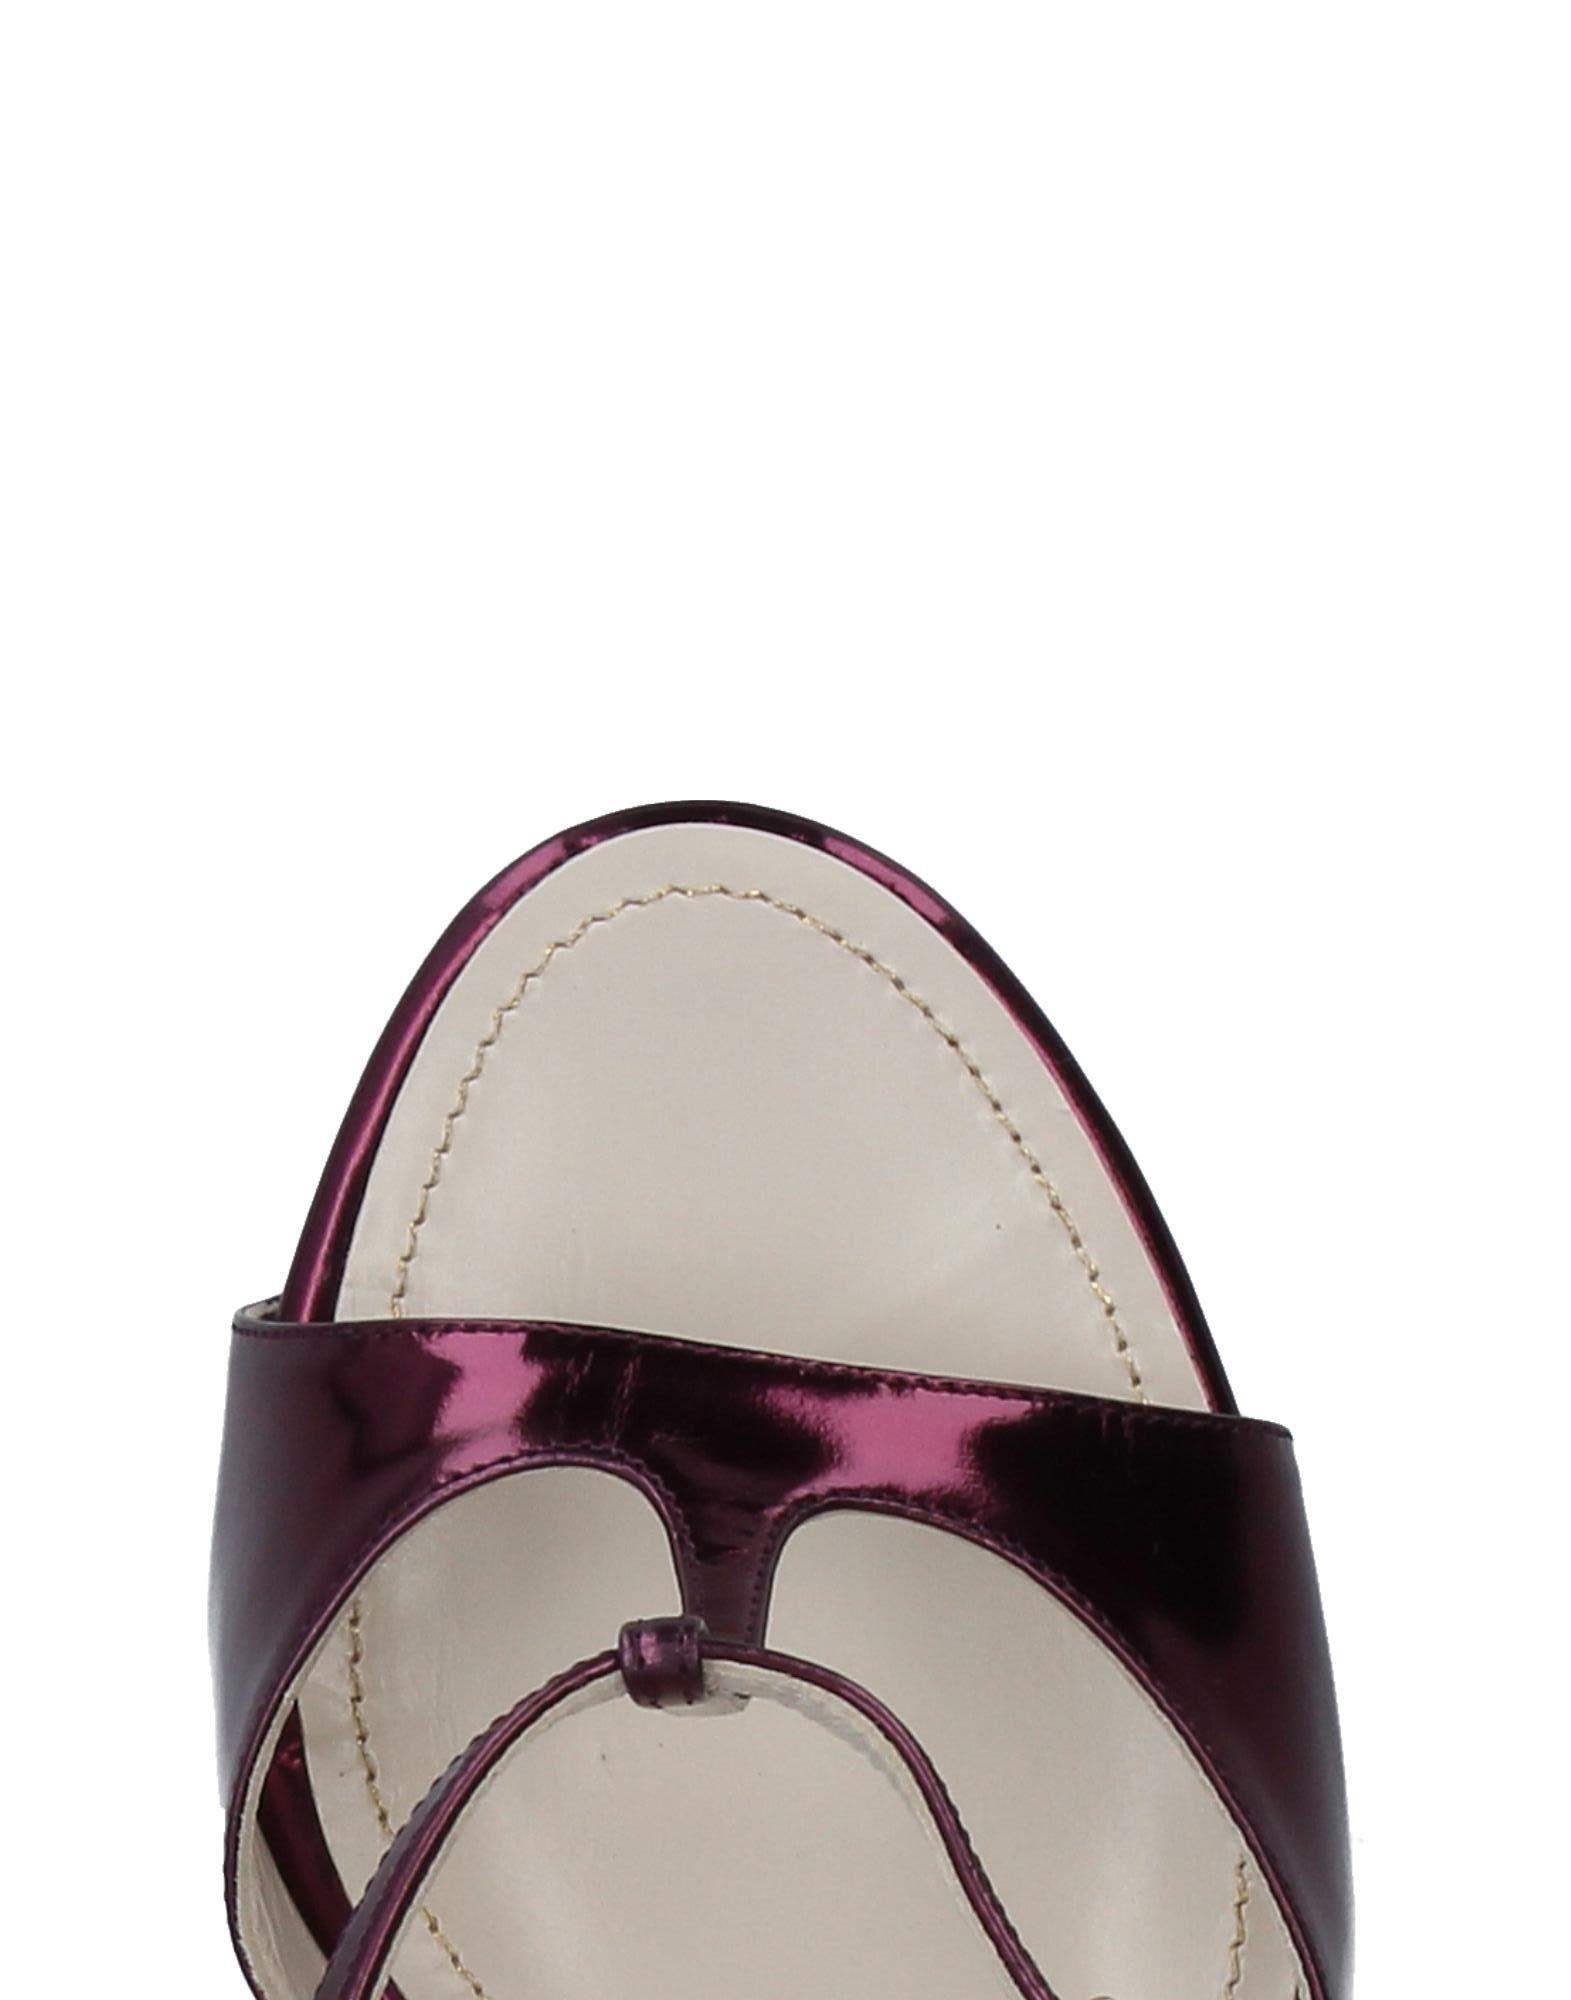 John Galliano Sandalen Damen  11362678LUGut aussehende strapazierfähige Schuhe